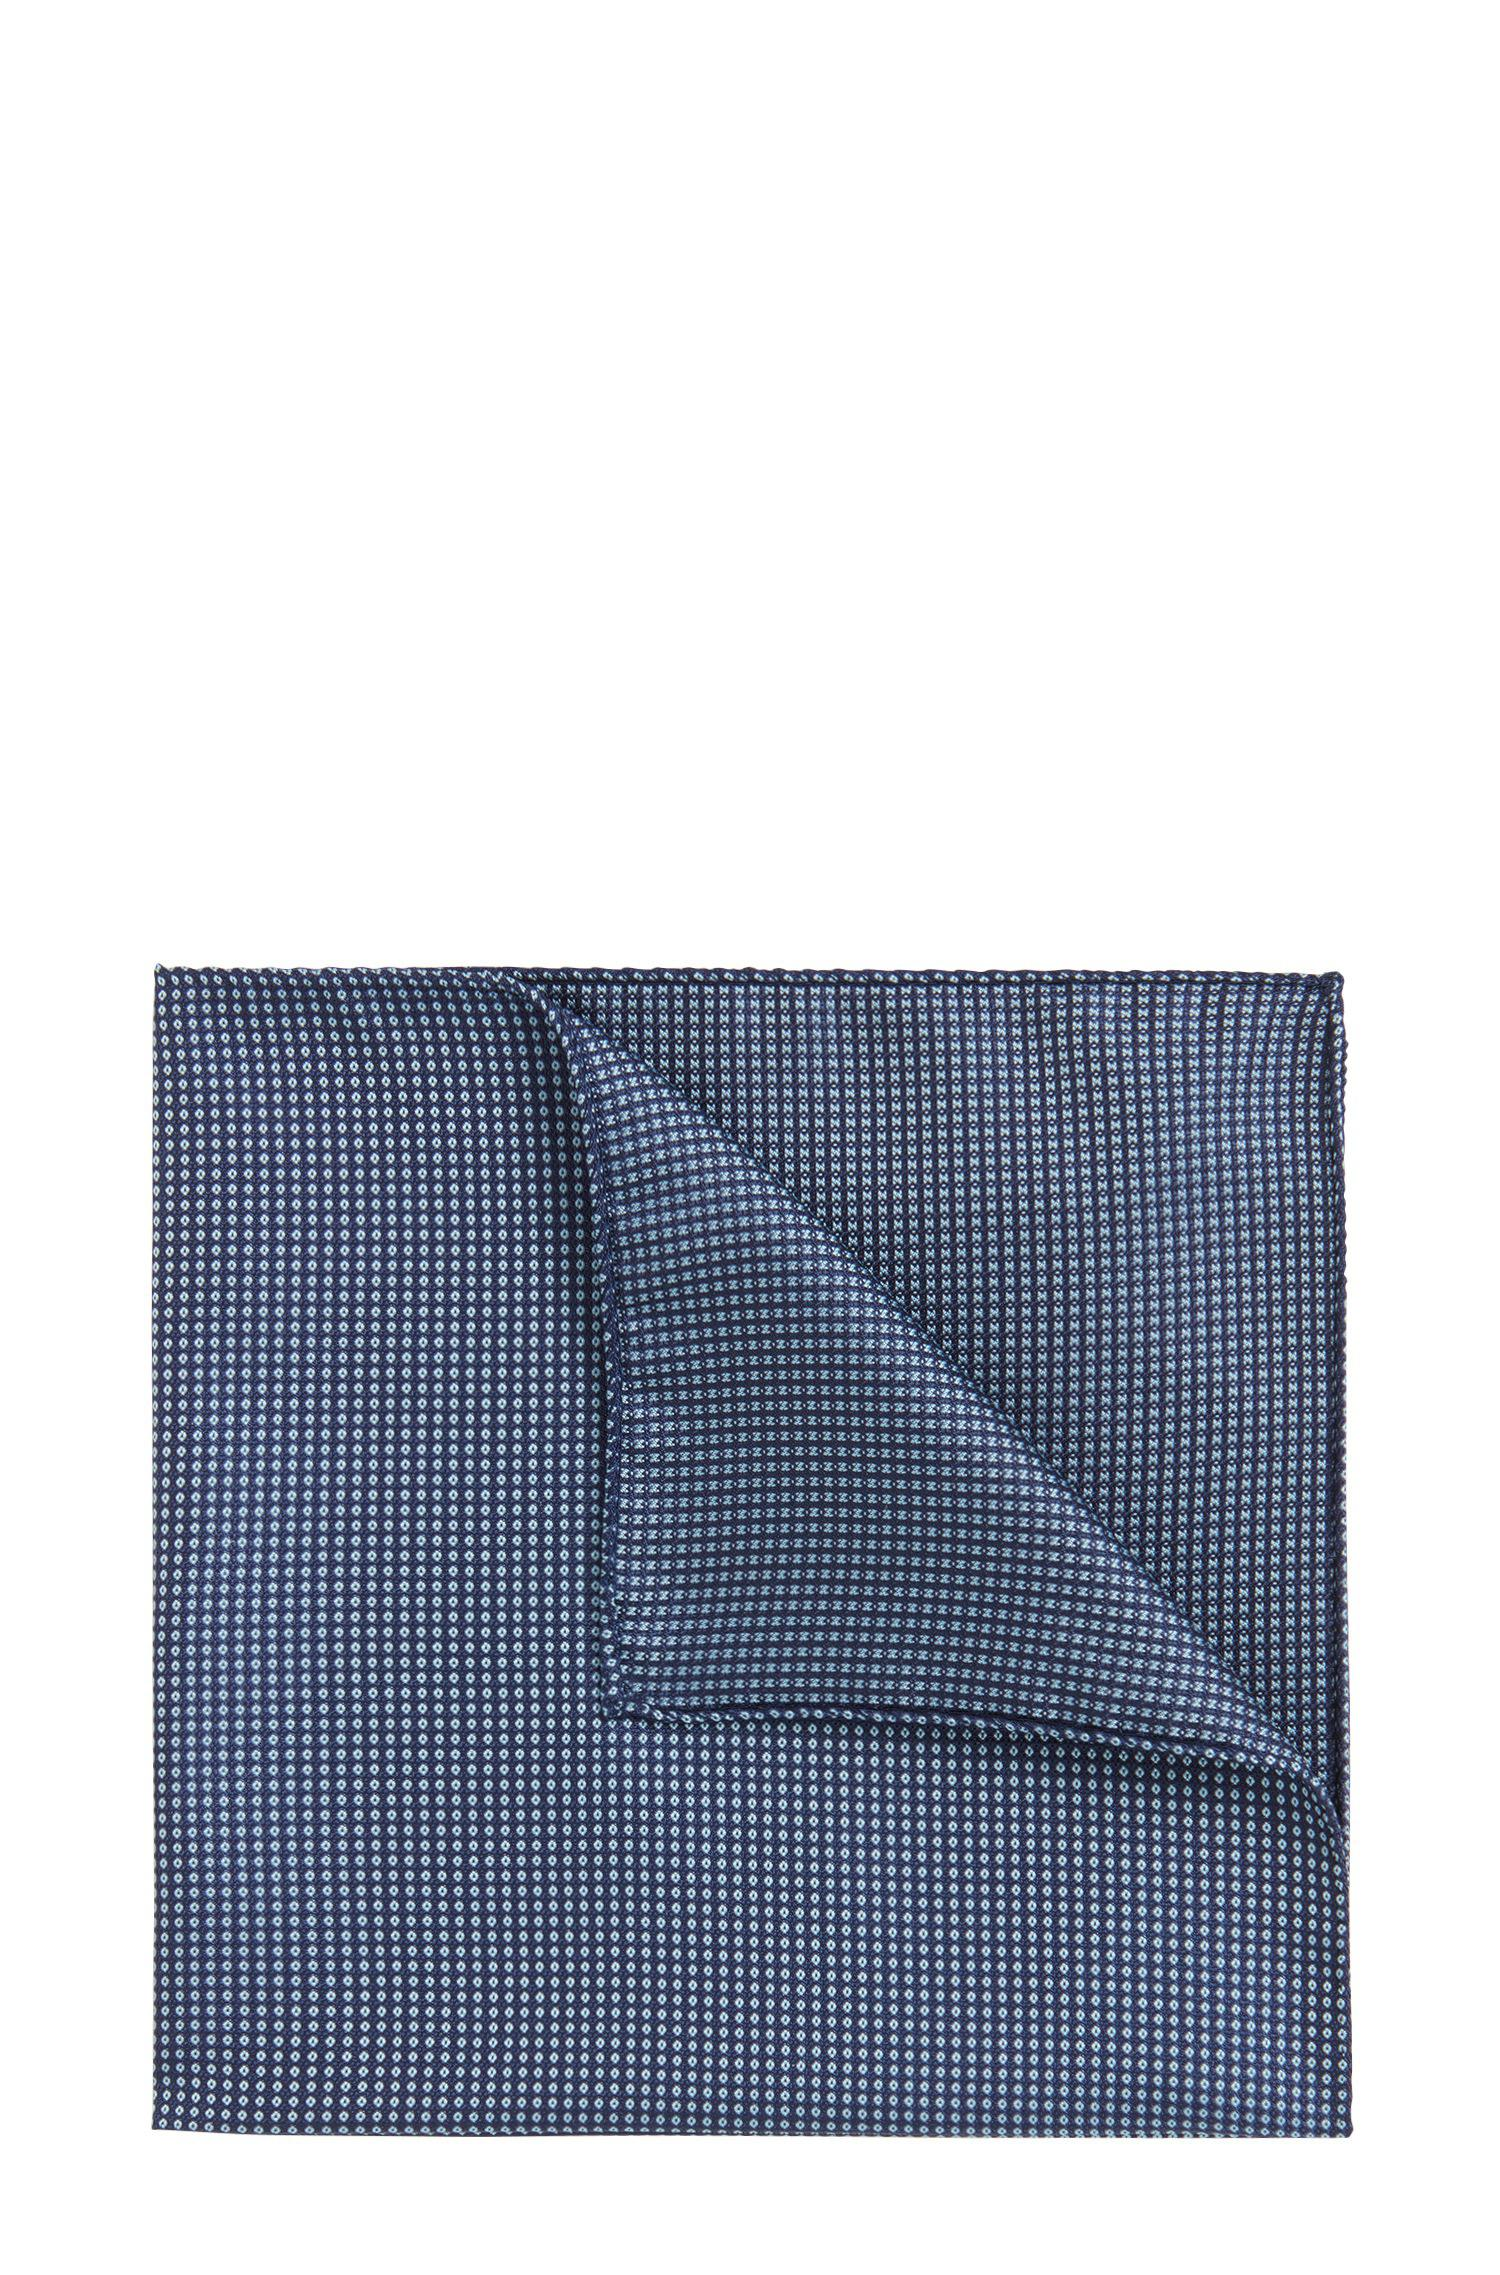 Italian-made patterned pocket square in silk jacquard BOSS 82sIF0j